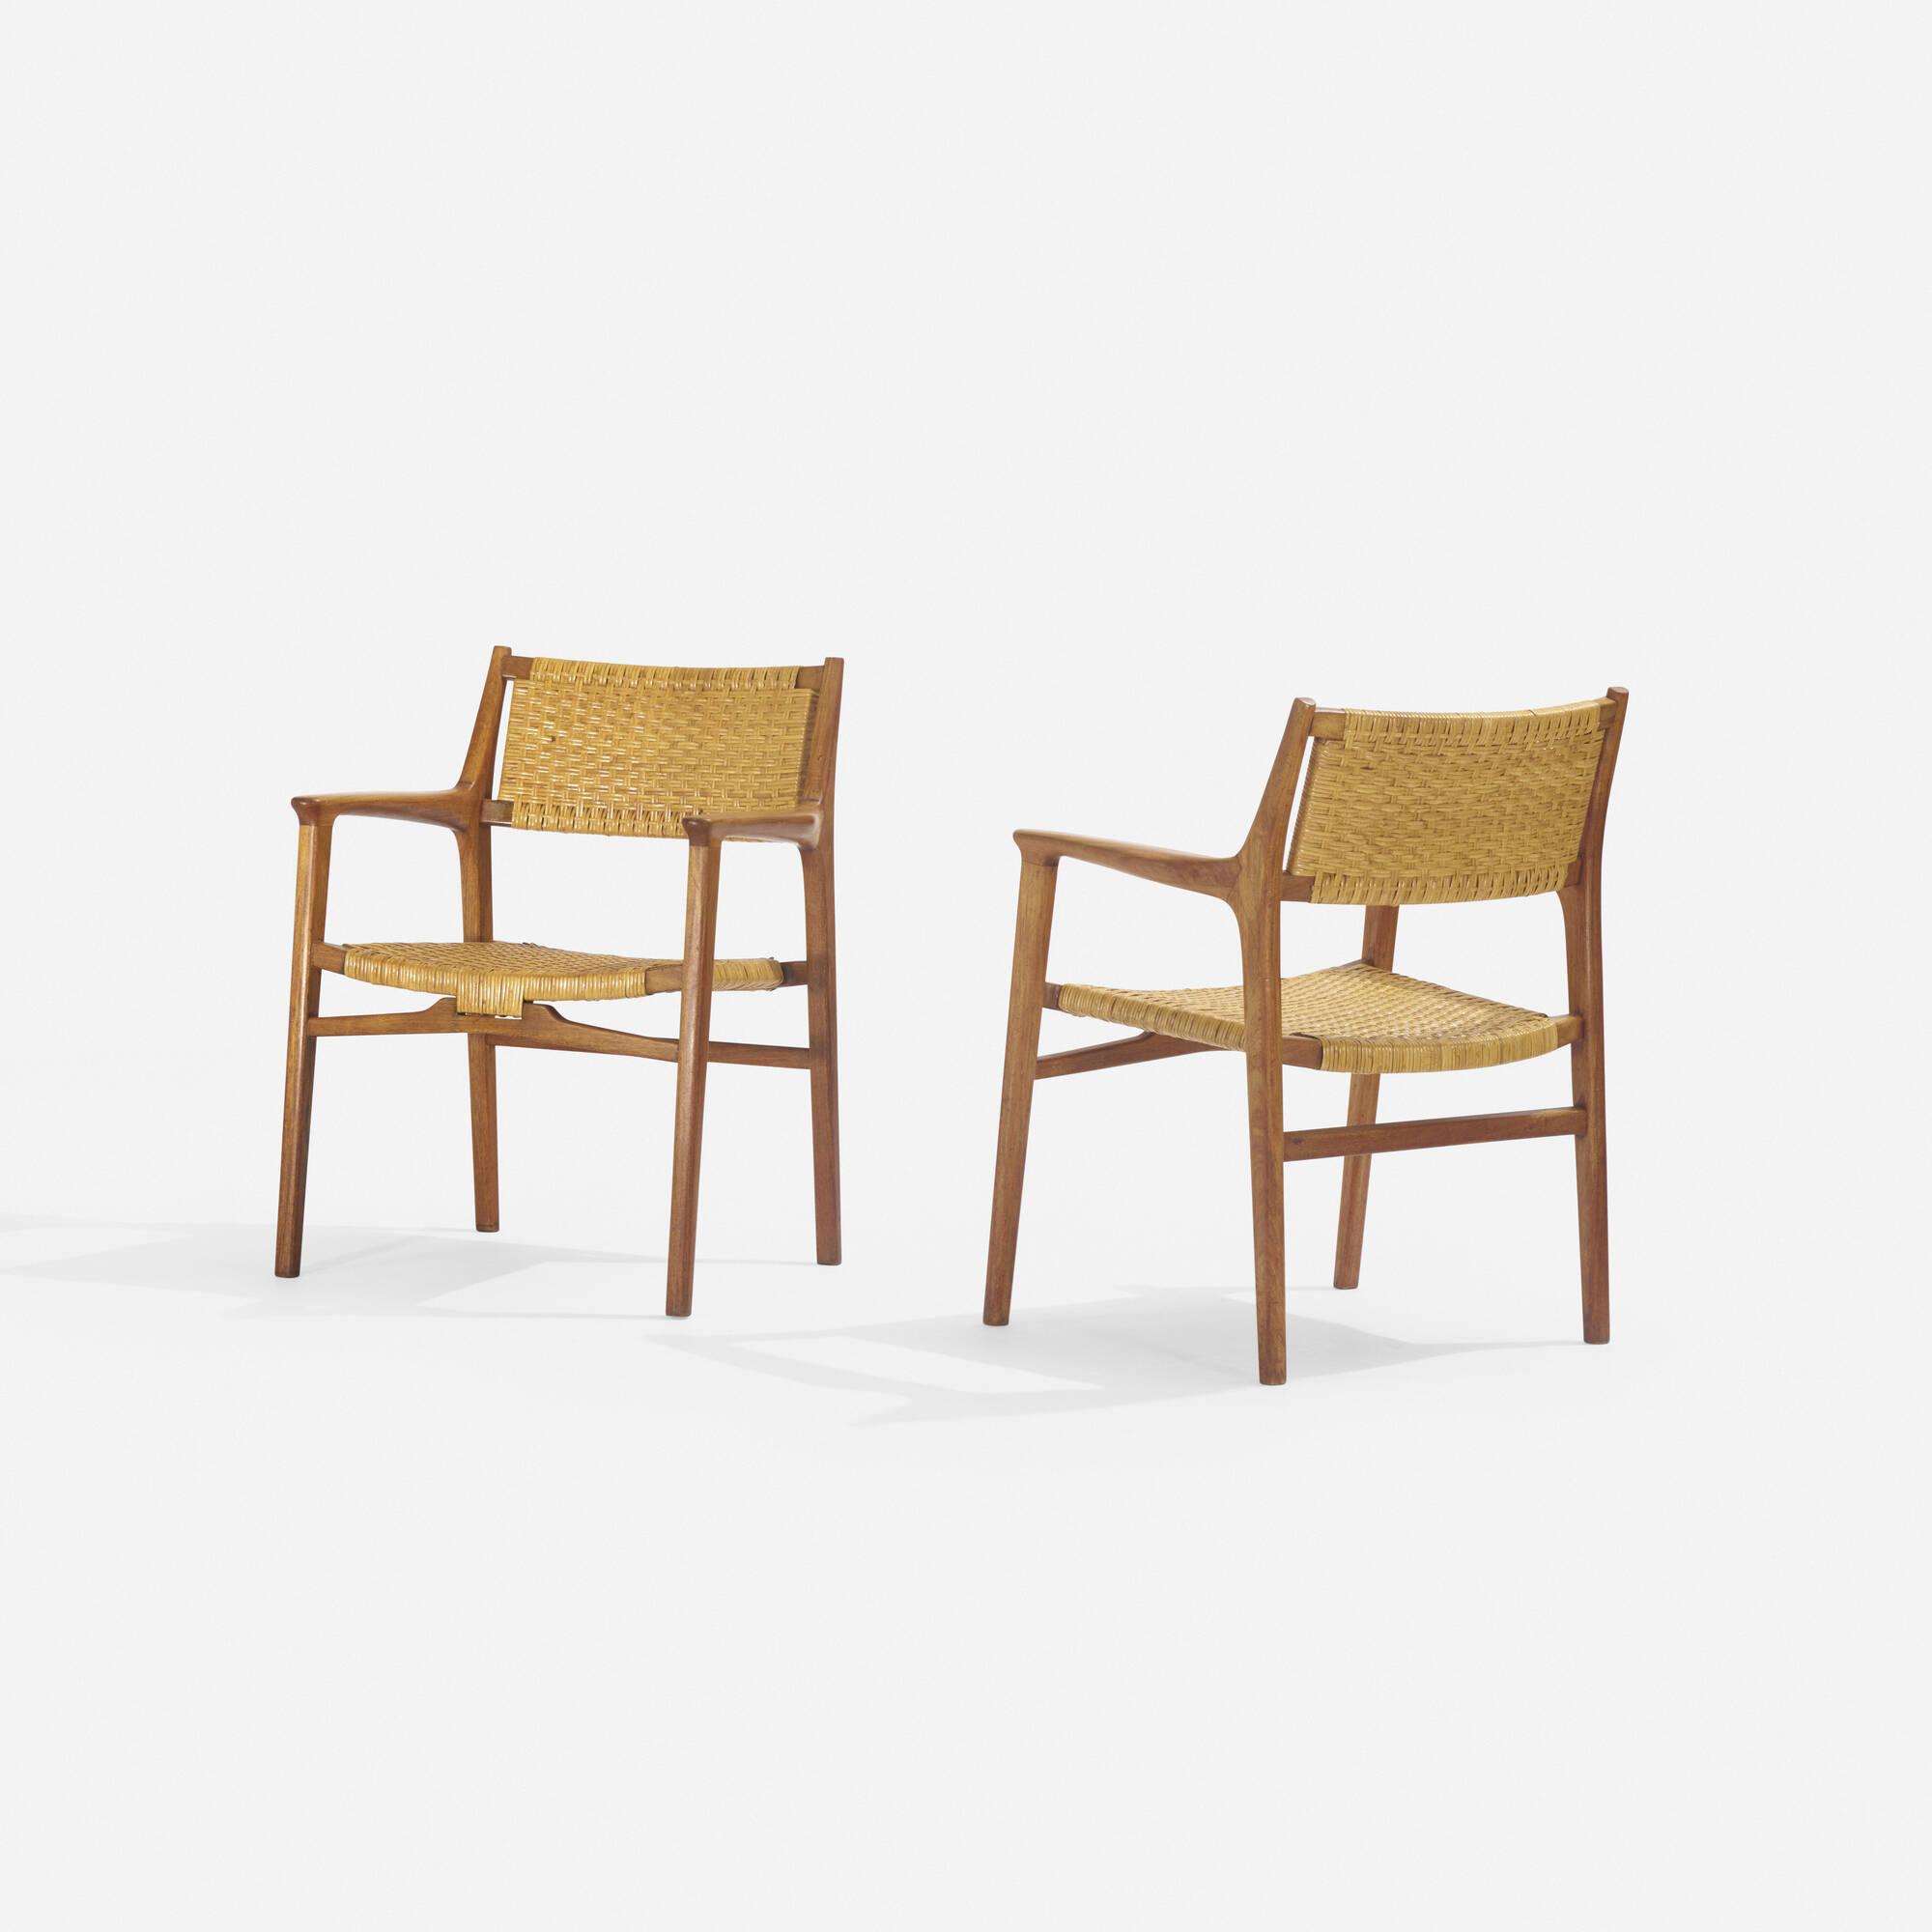 233: Hans J. Wegner / rare lounge chairs, pair (2 of 3)